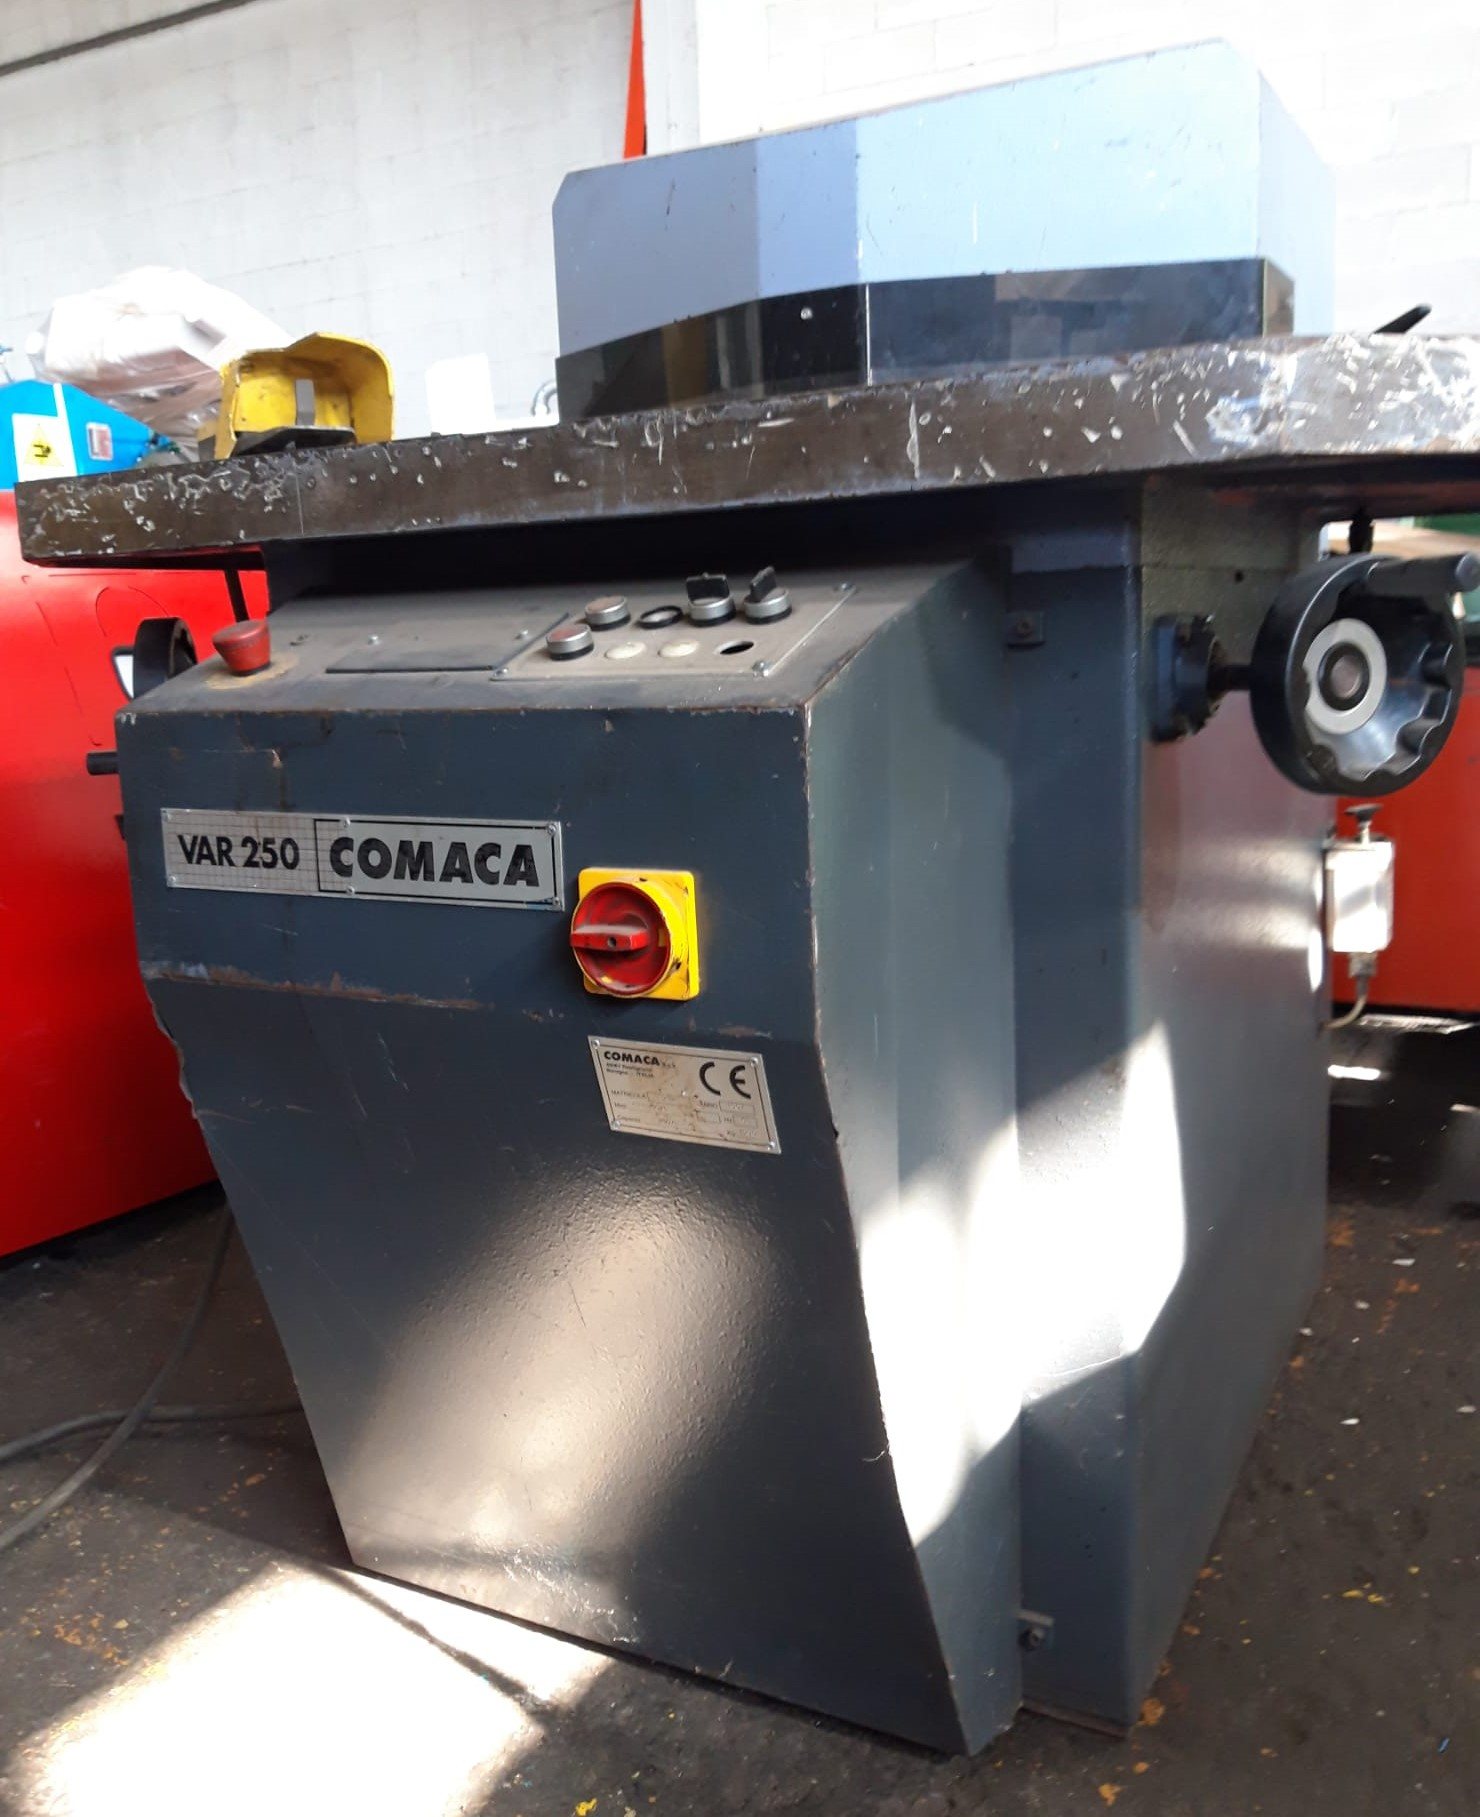 Scantonatrice idraulica Comaca var 250 in vendita - foto 2